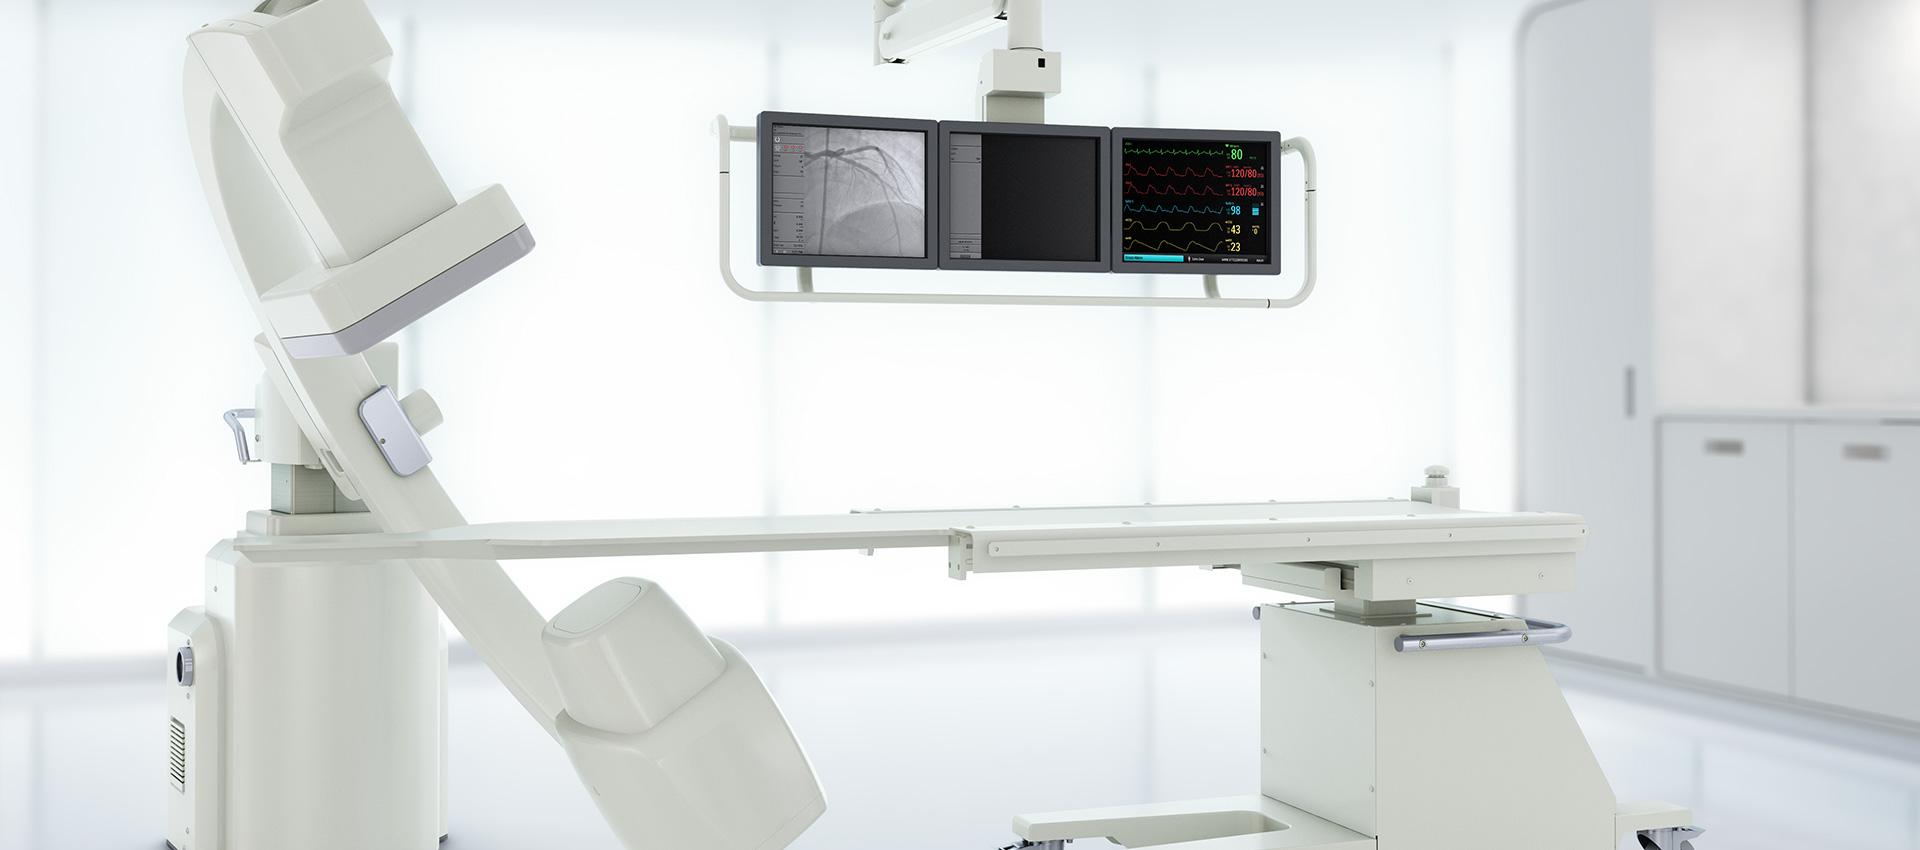 indg_Cases_Header_images_Philips_Healthcare